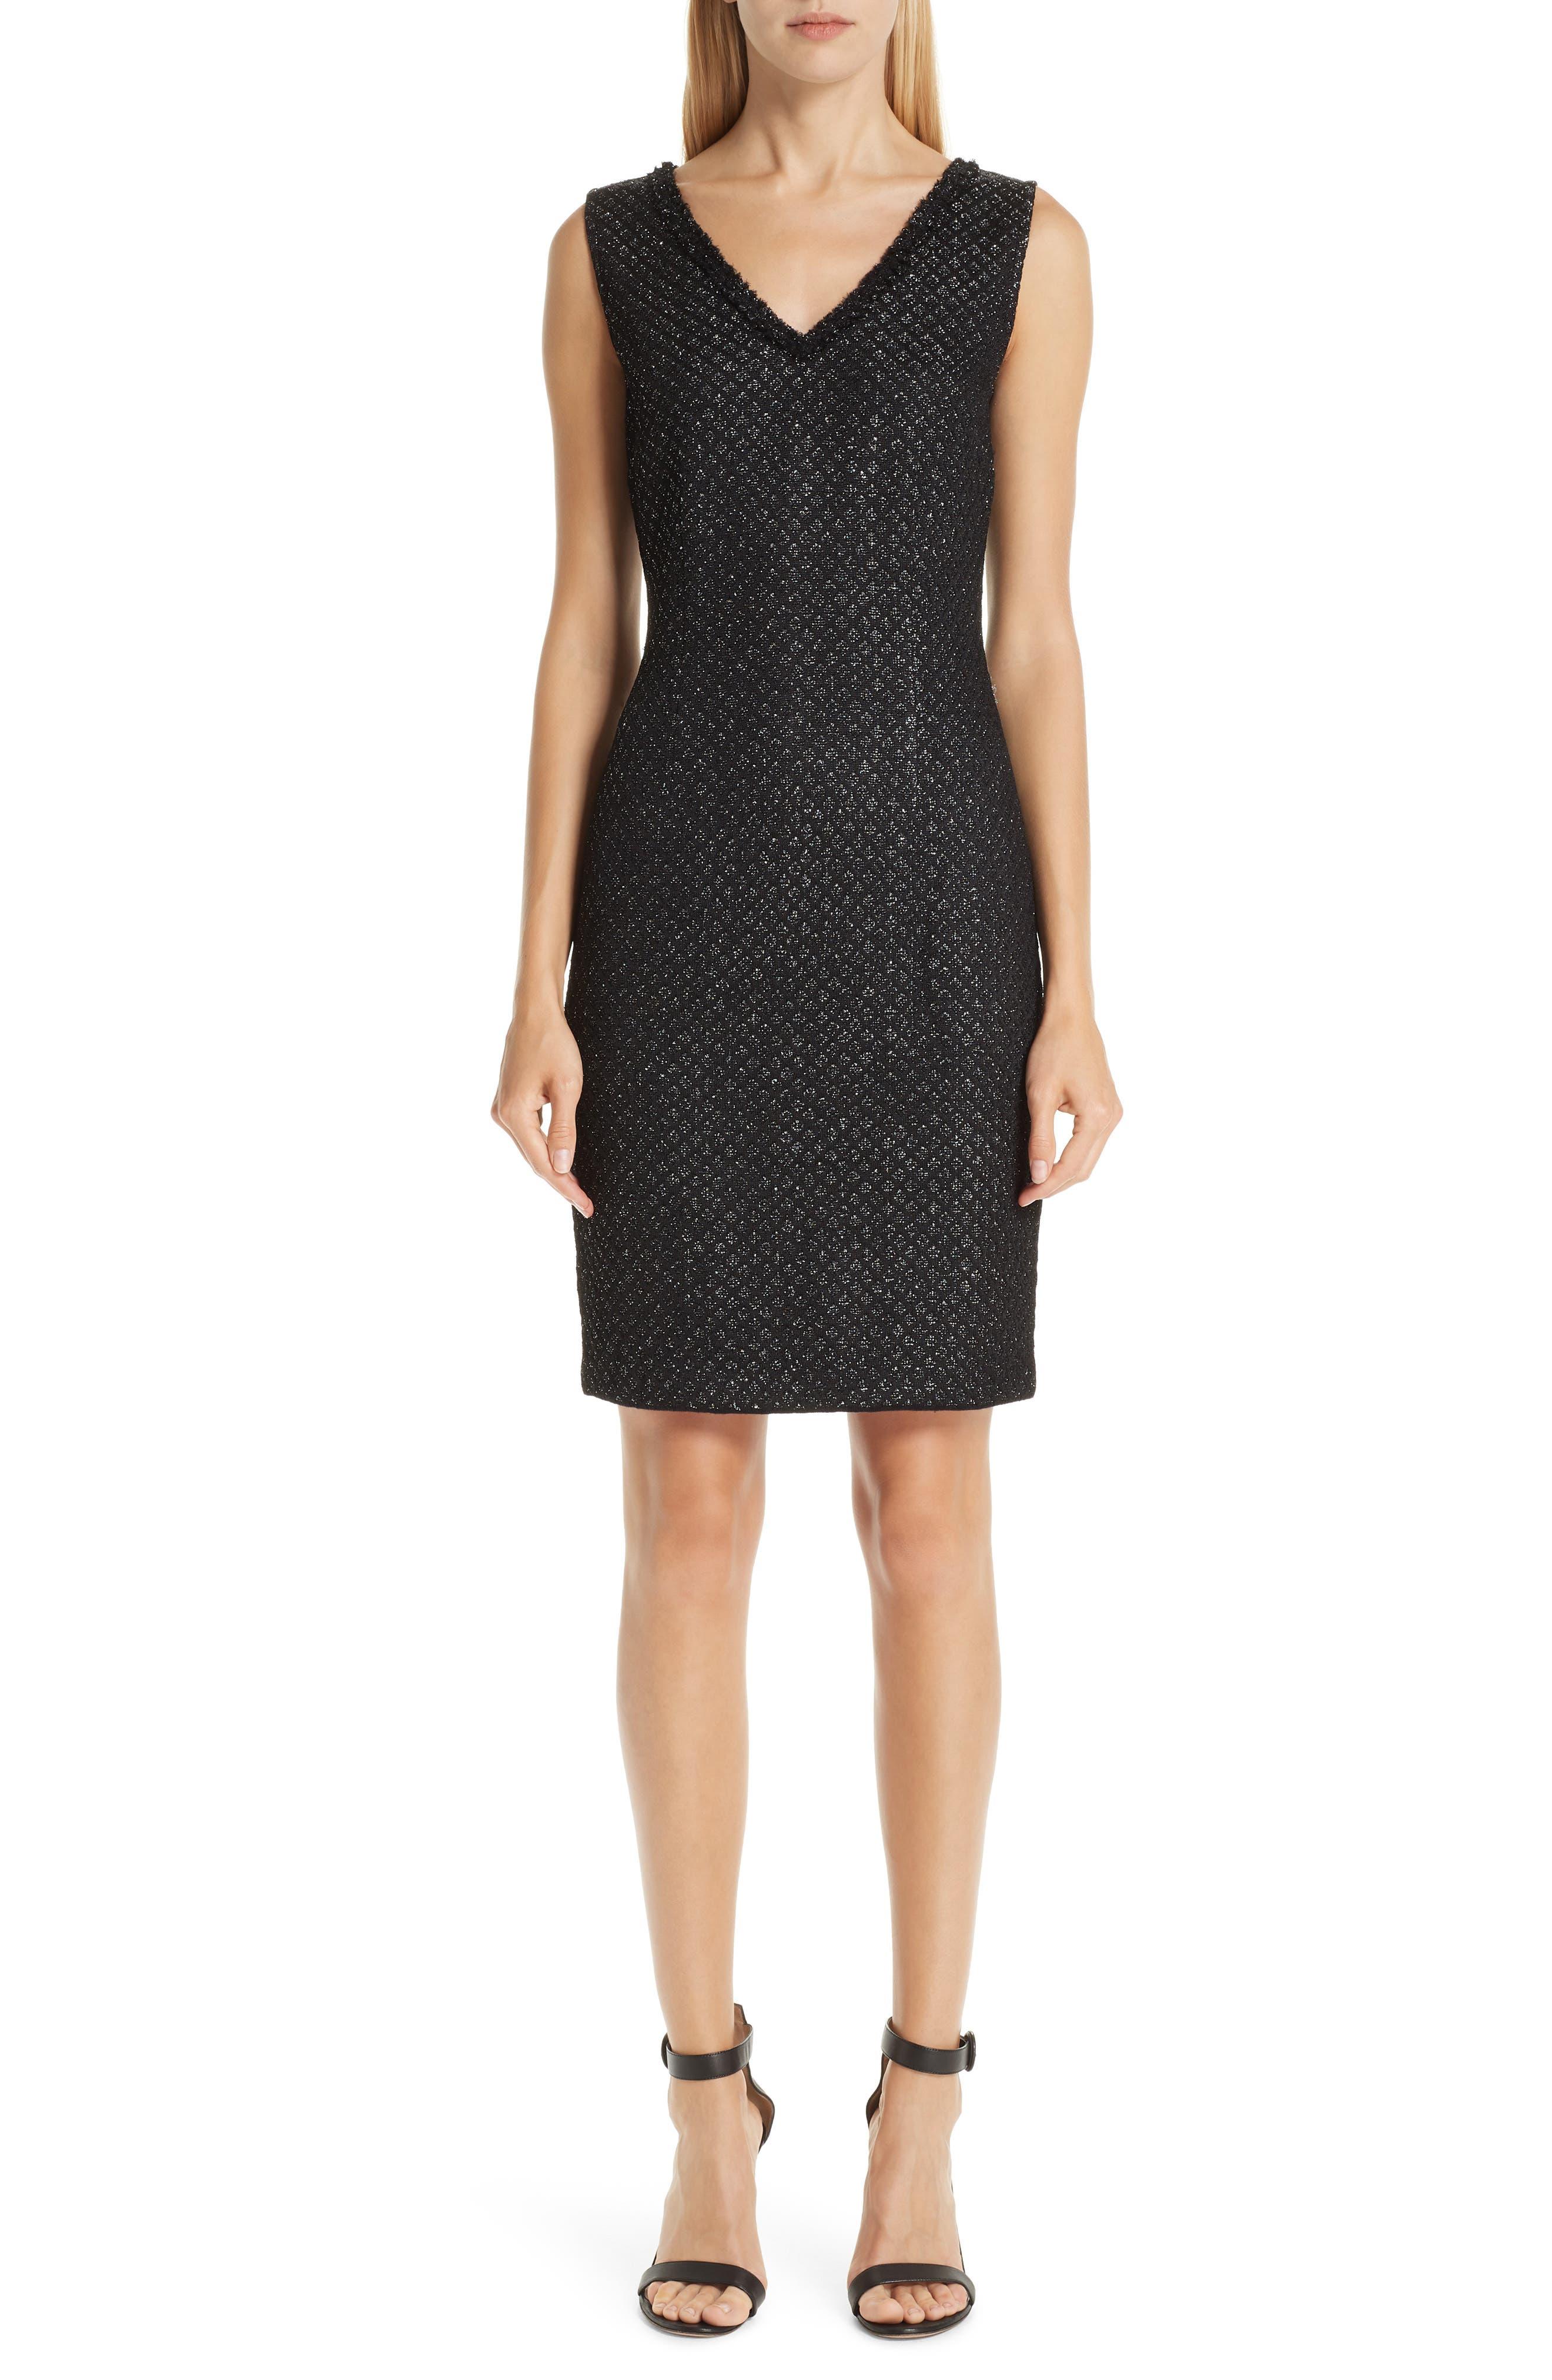 St. John Collection Shimmer Inlay Brocade Knit Dress, Black